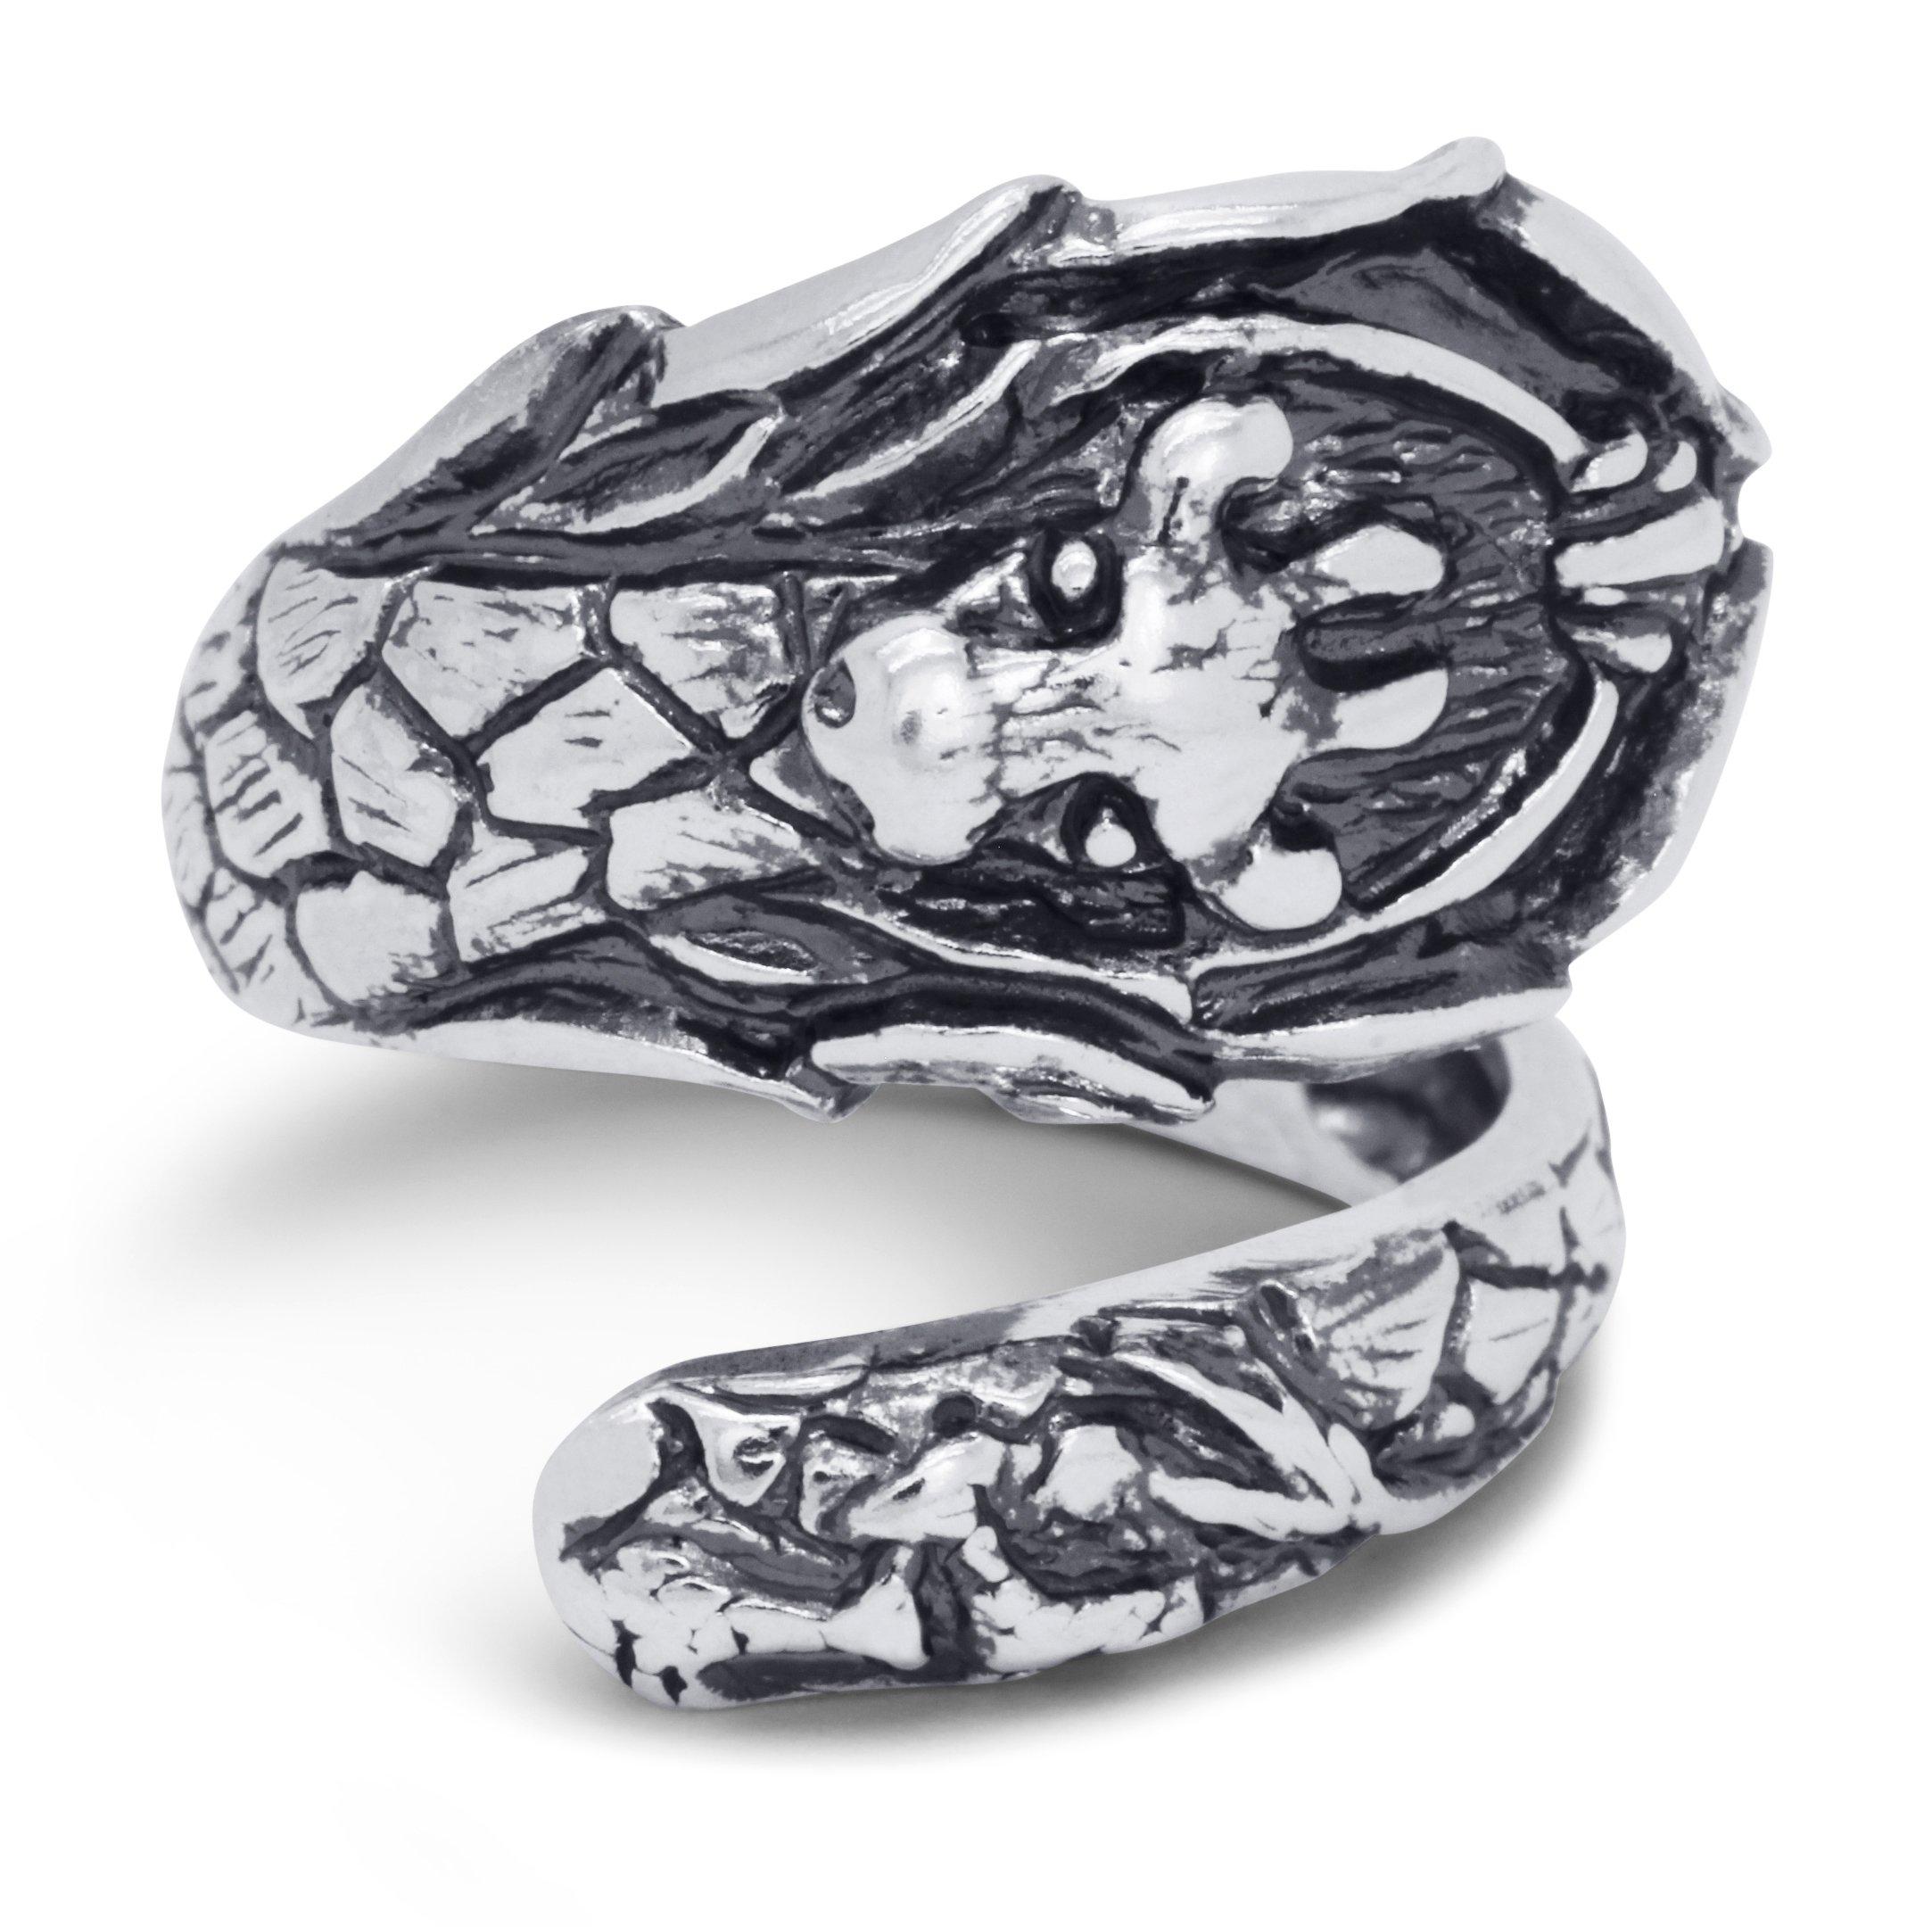 Silver-Wear Swirls Sterling Silver Antique Finish Serengeti Giraffe Spoon Style Ring